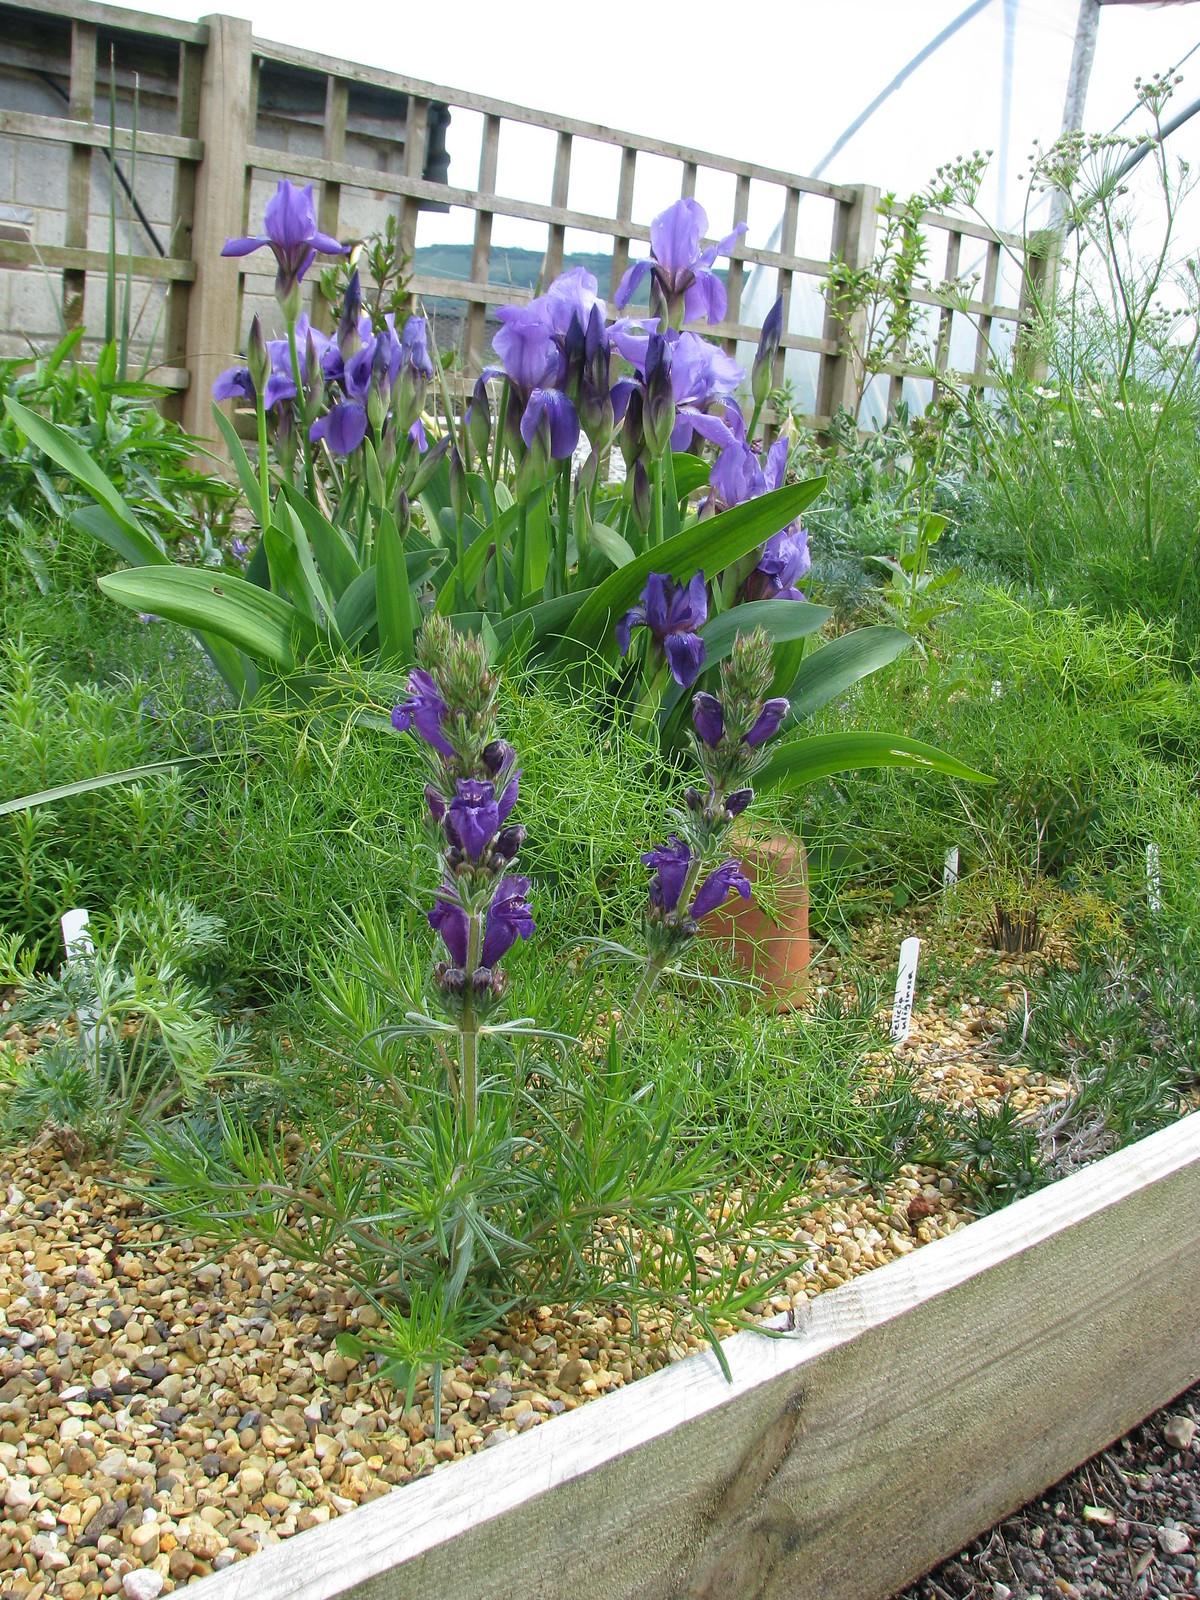 Dracocephalum austriacum and Iris aphylla